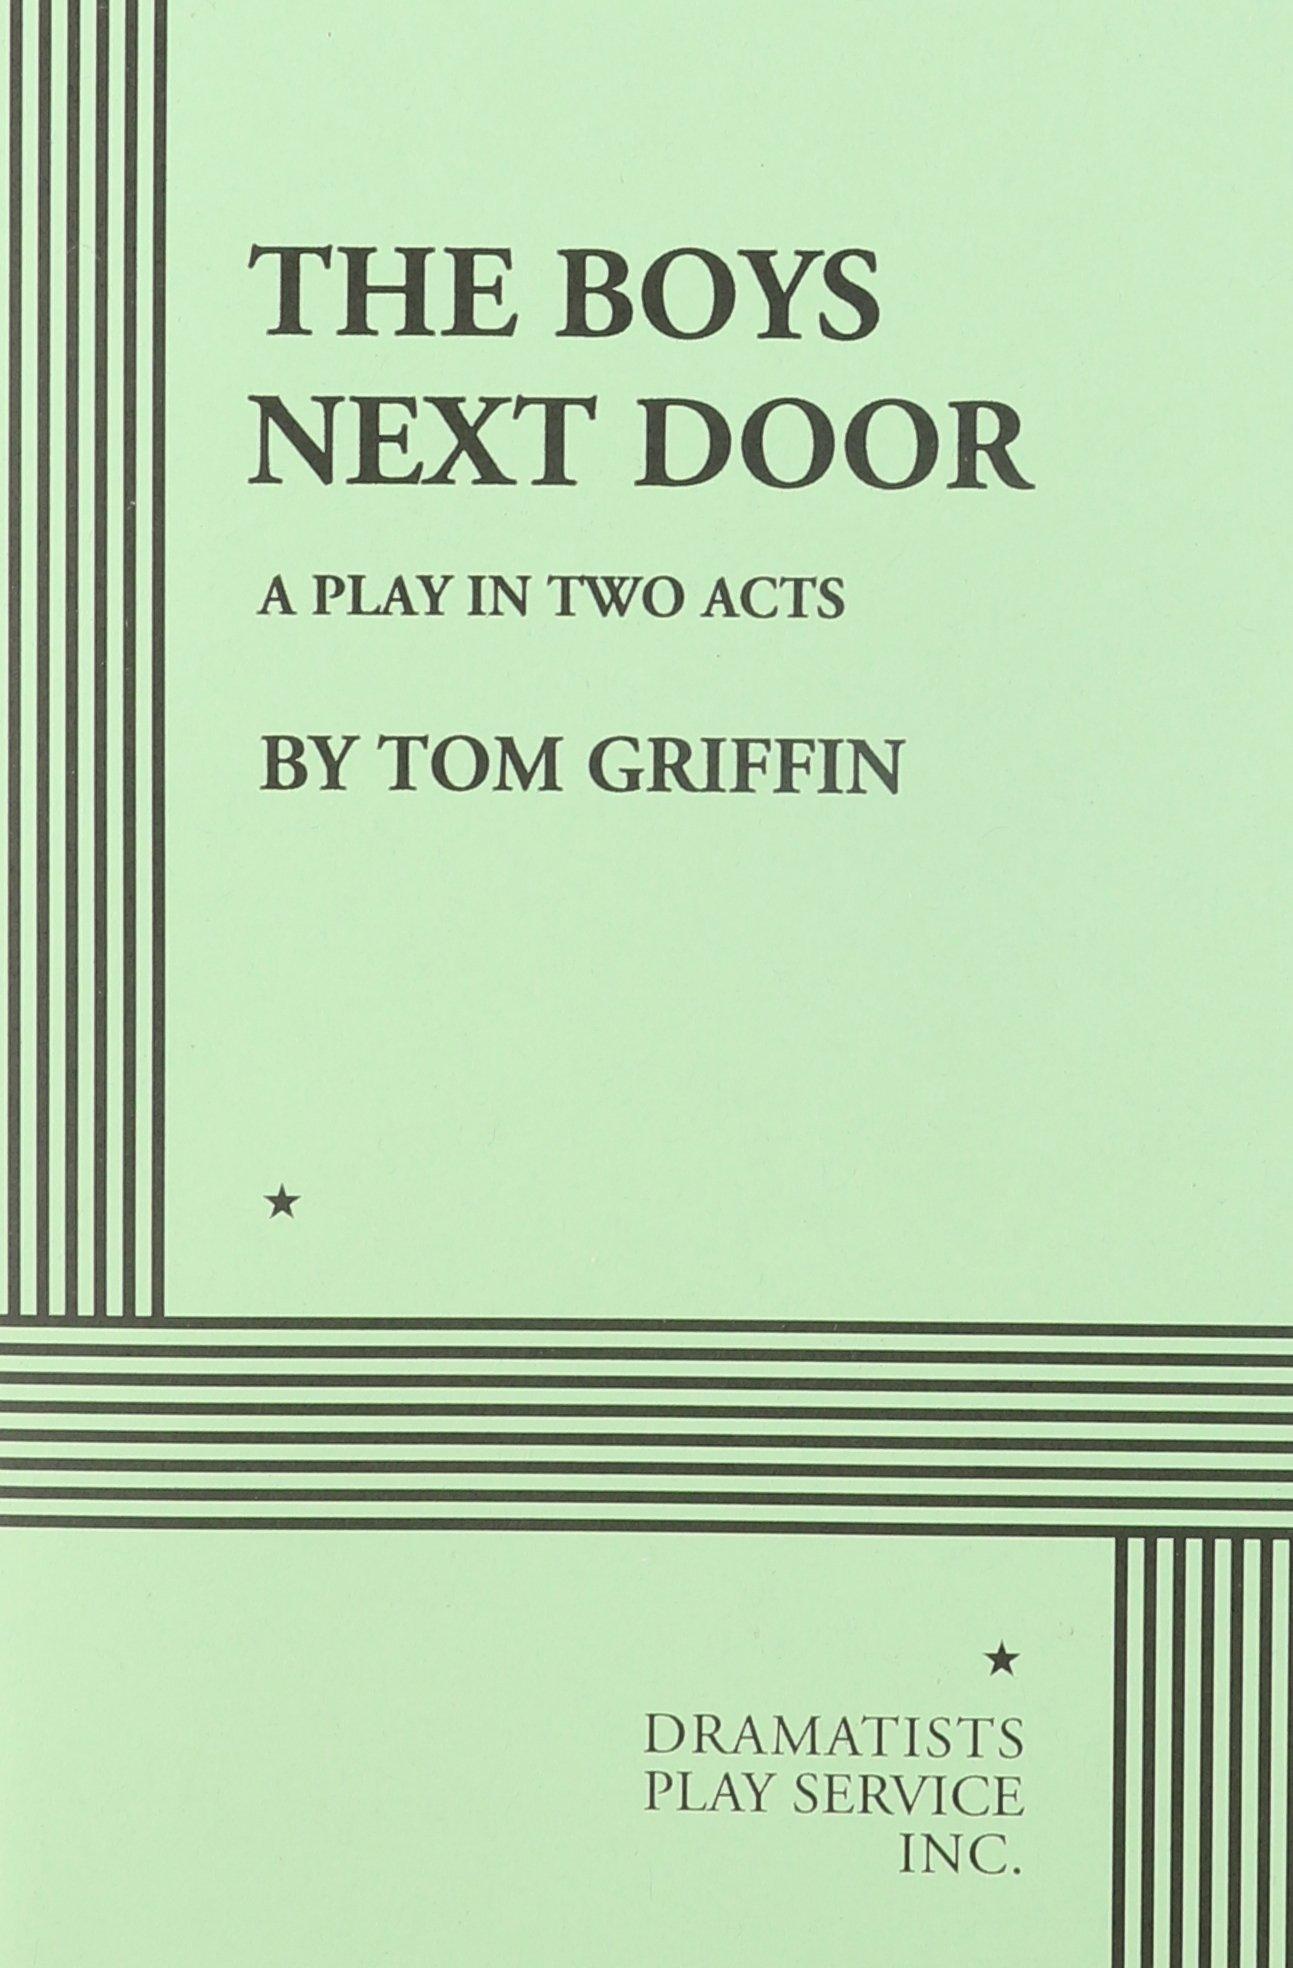 Attrayant The Boys Next Door.: Tom Griffin, Tom Griffin: 9780822201434: Amazon.com:  Books